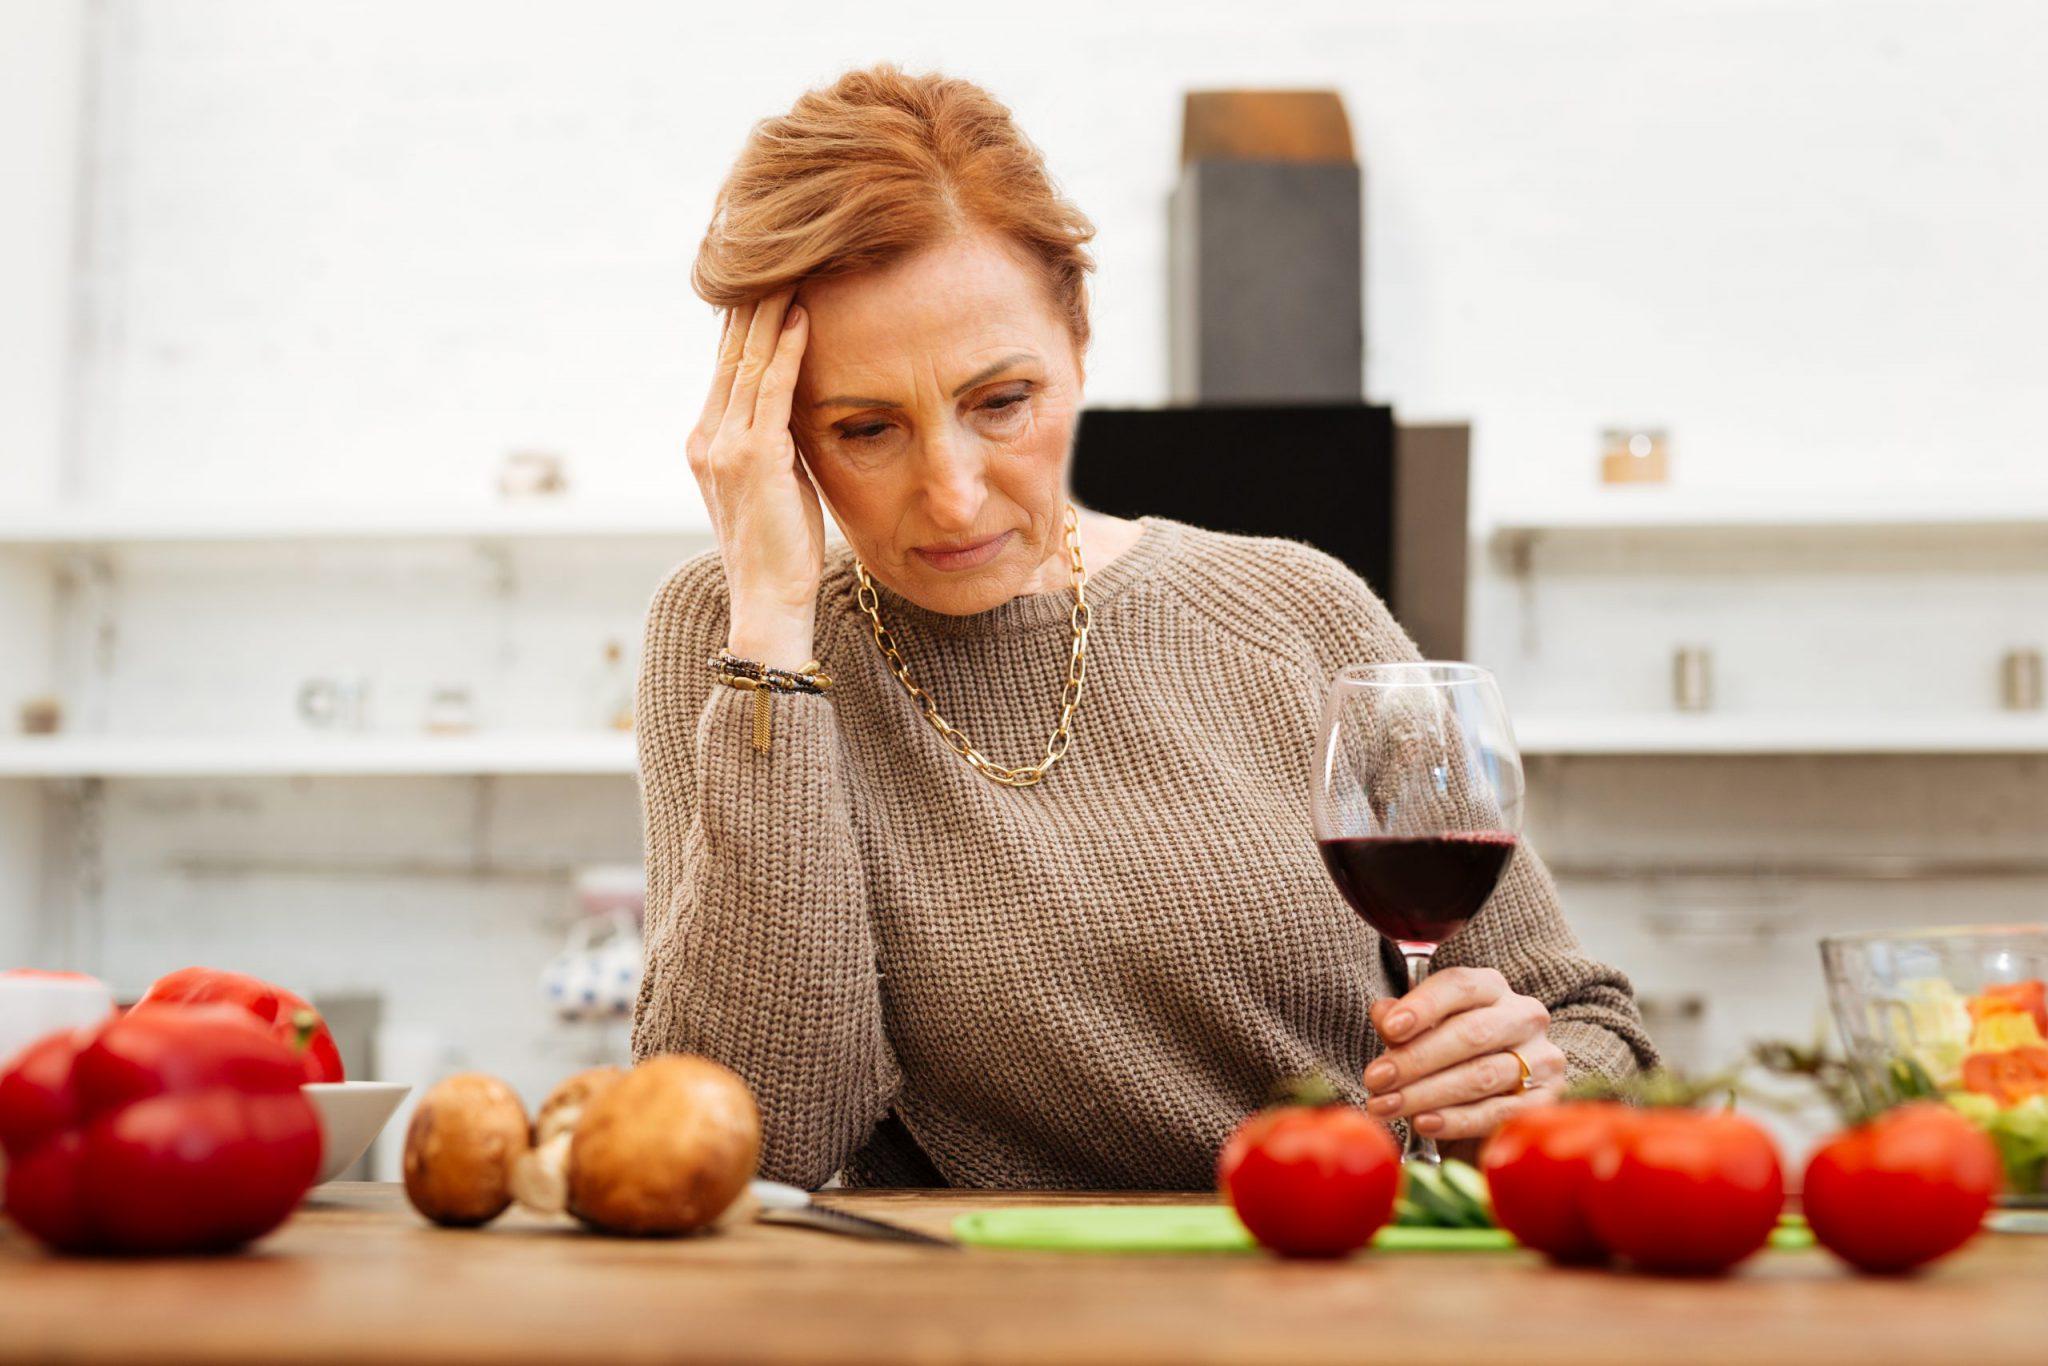 Rethinking Drinking: Should I Cut Back or Quit?